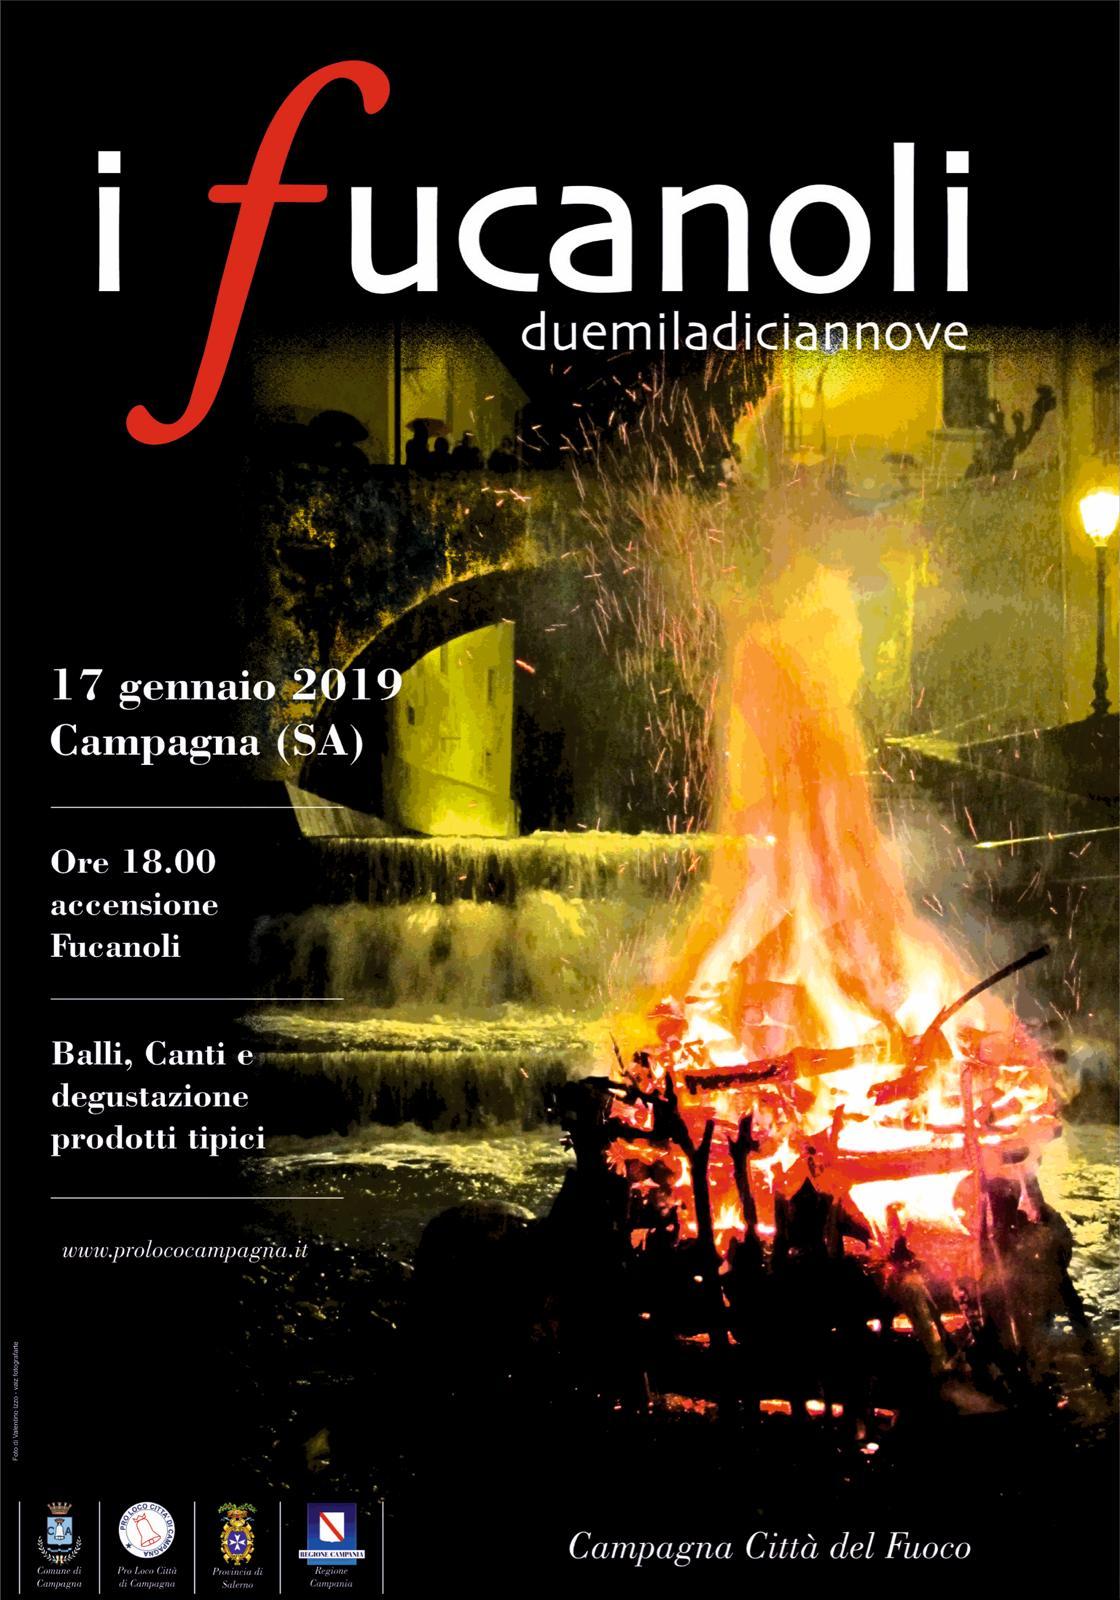 I Fucanoli-2019-Campagna